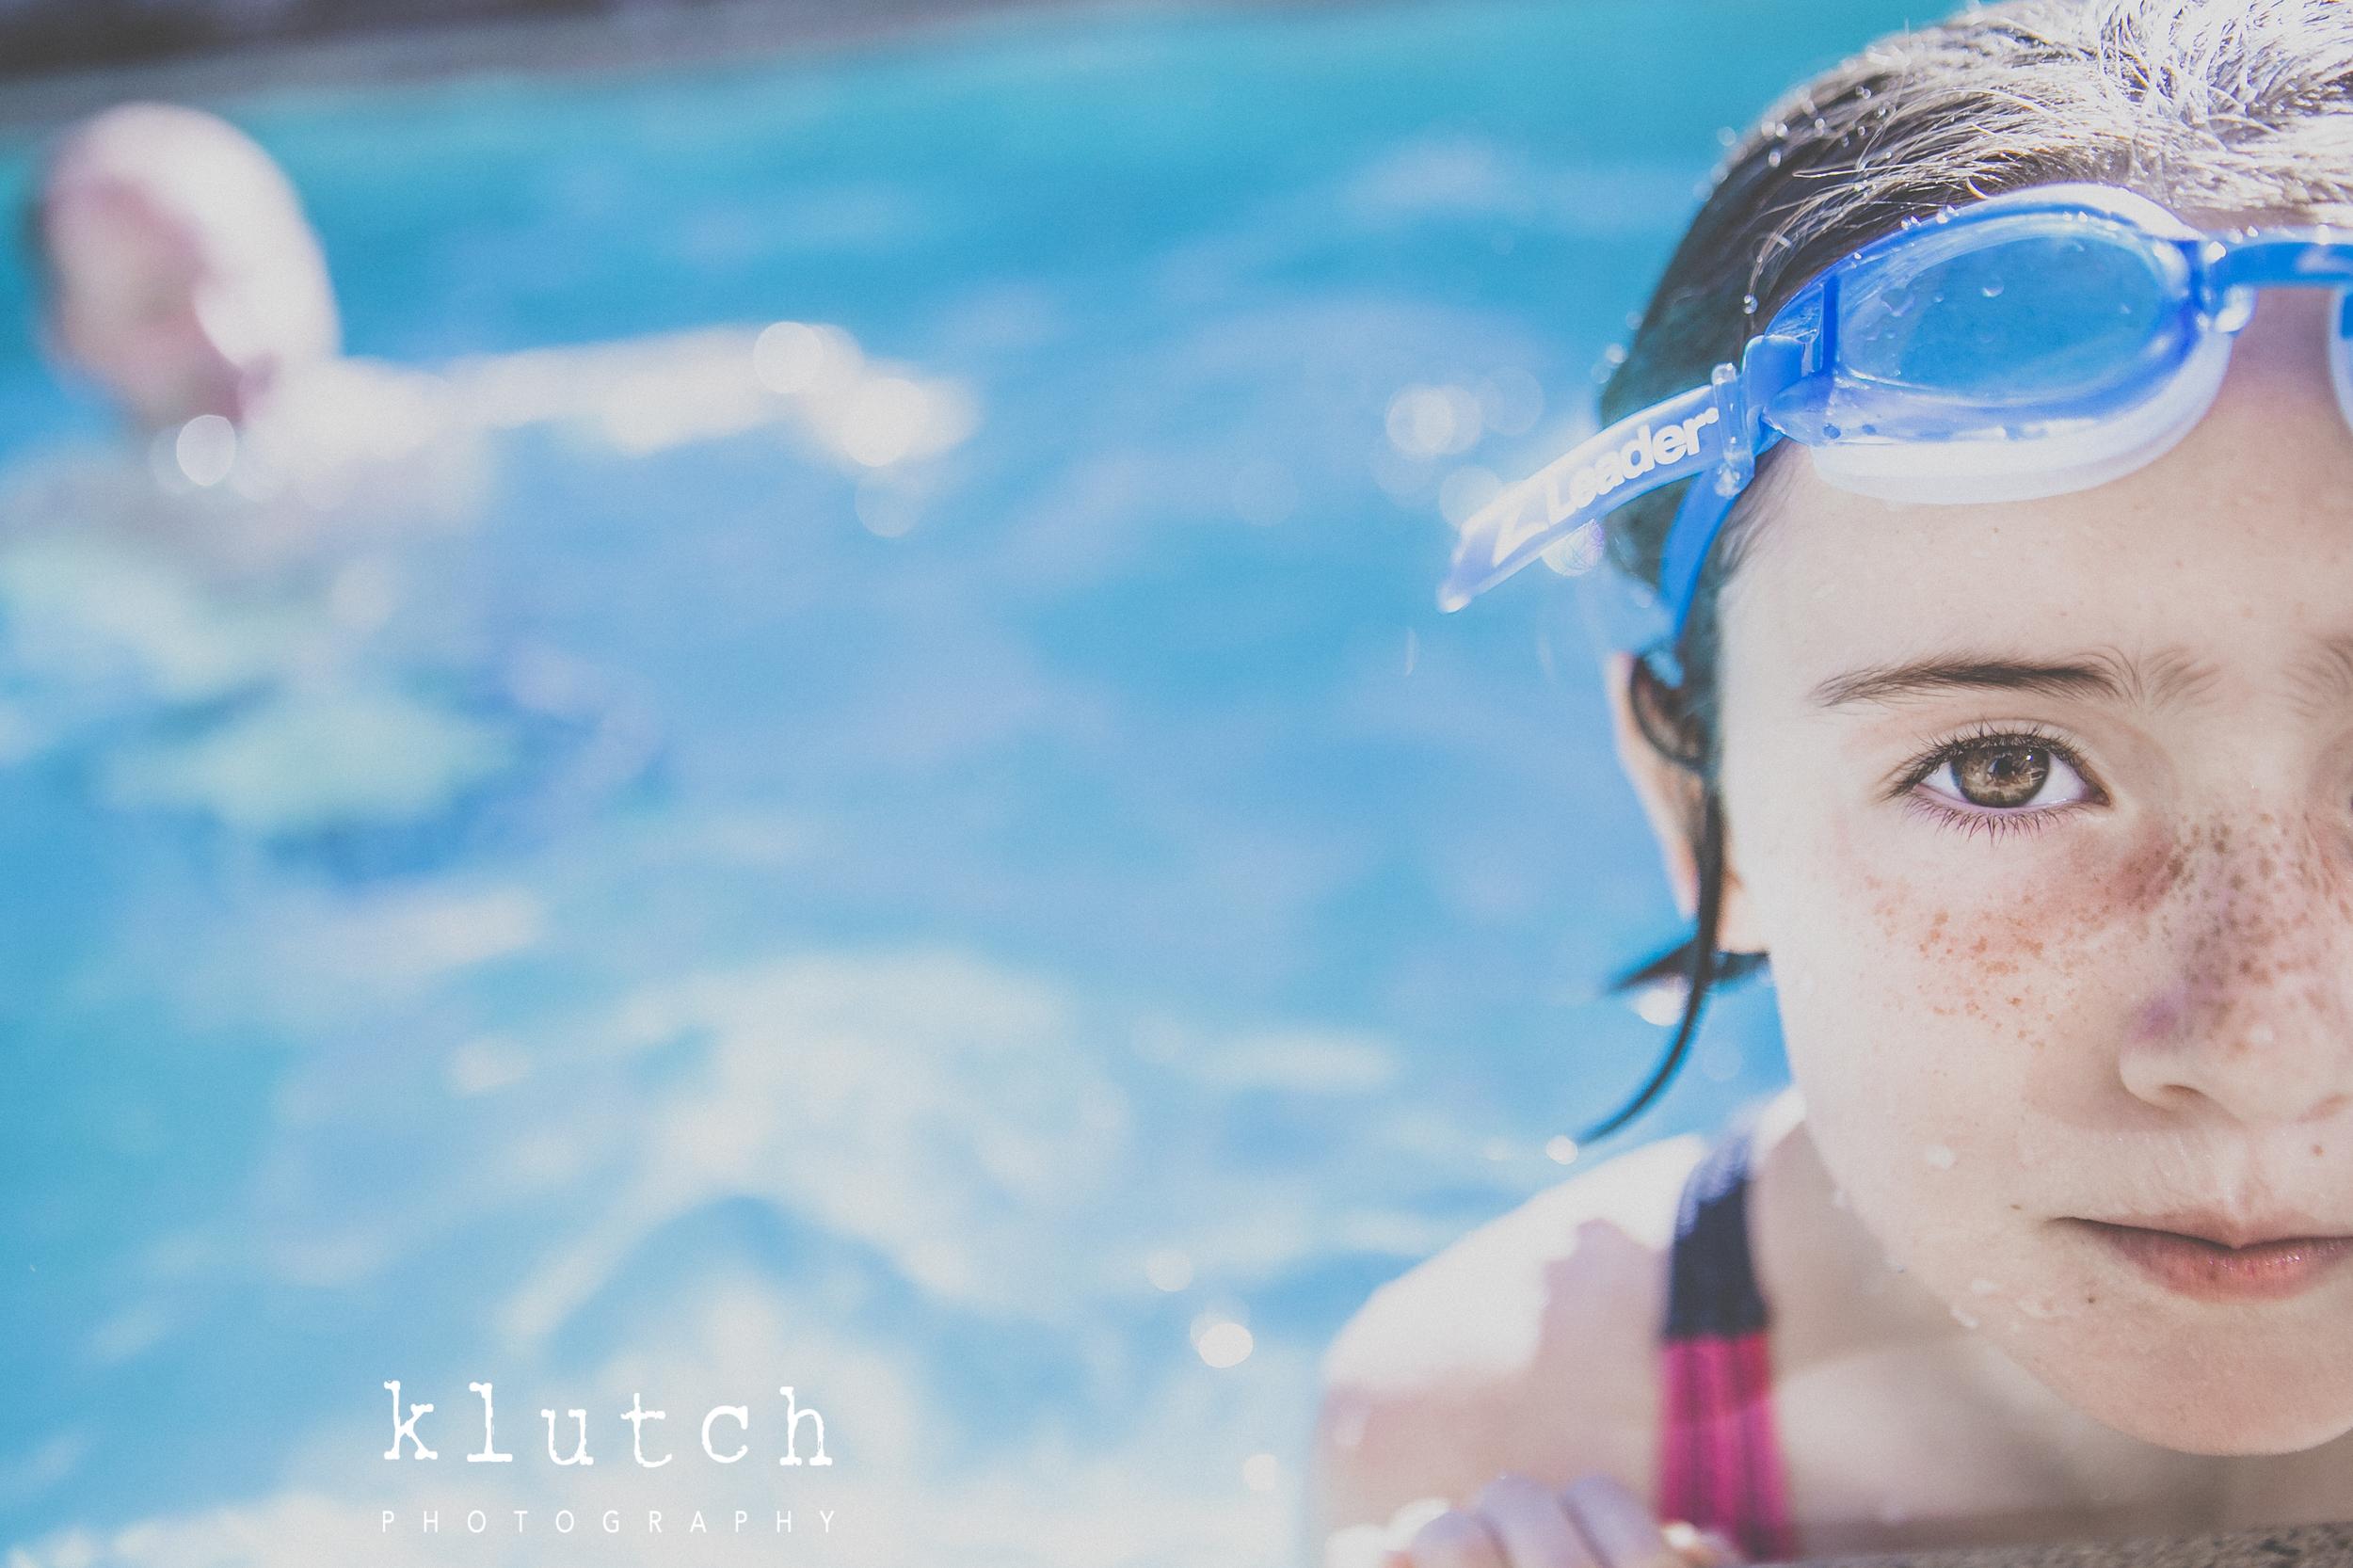 Klutch Photography,white rock family photographer, vancouver family photographer, whiterock lifestyle photographer, life unscripted photographer, life unscripted session, photography,Dina Ferreira Stoddard-9902.jpg